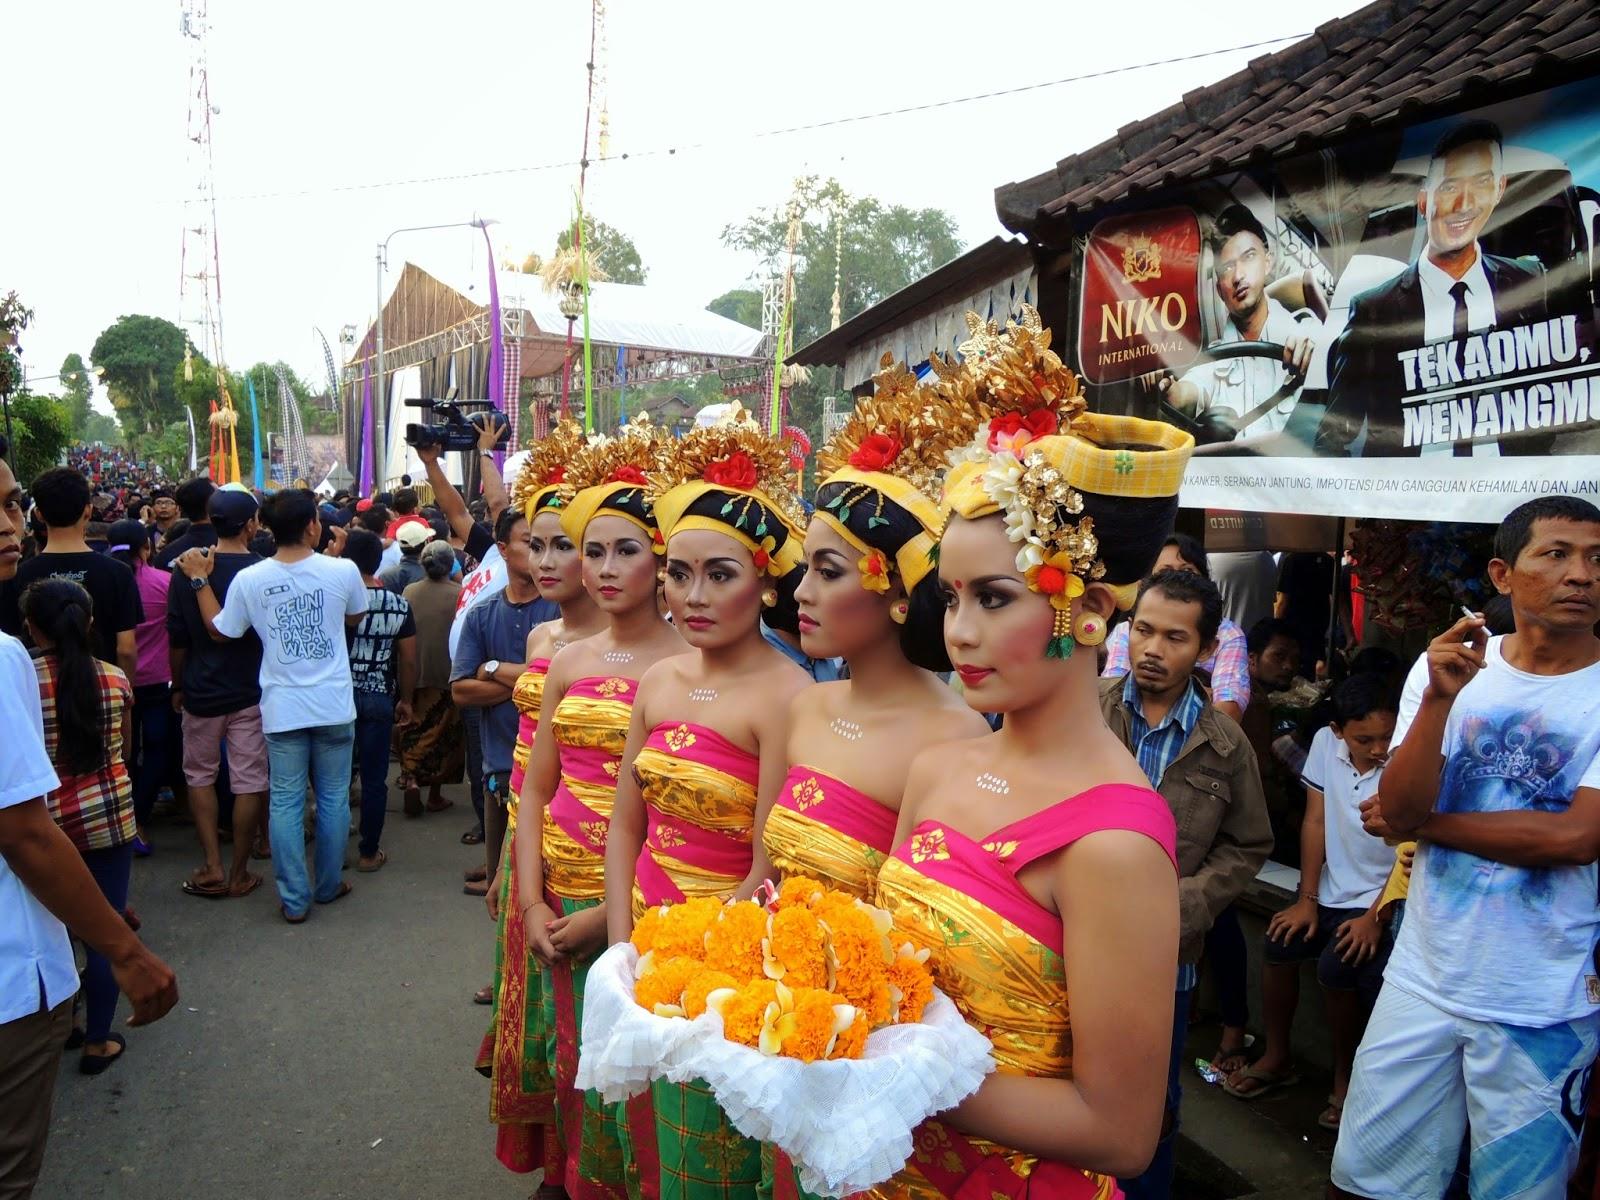 Balinese dancers, Tegallaland Ogoh Ogoh festival, Ubud